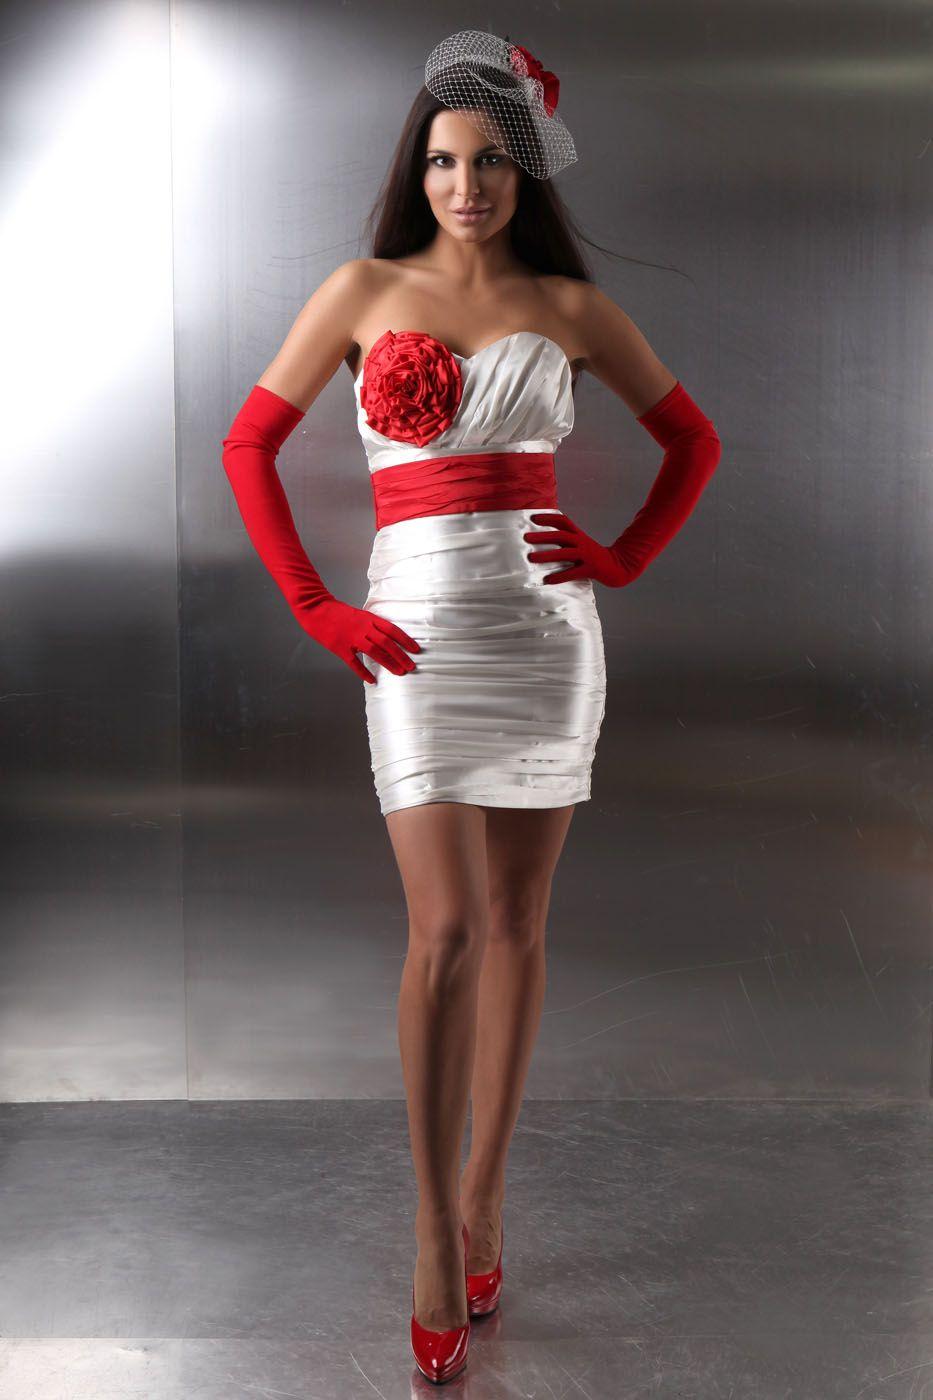 Kurz elegant weiß kleid Top 10